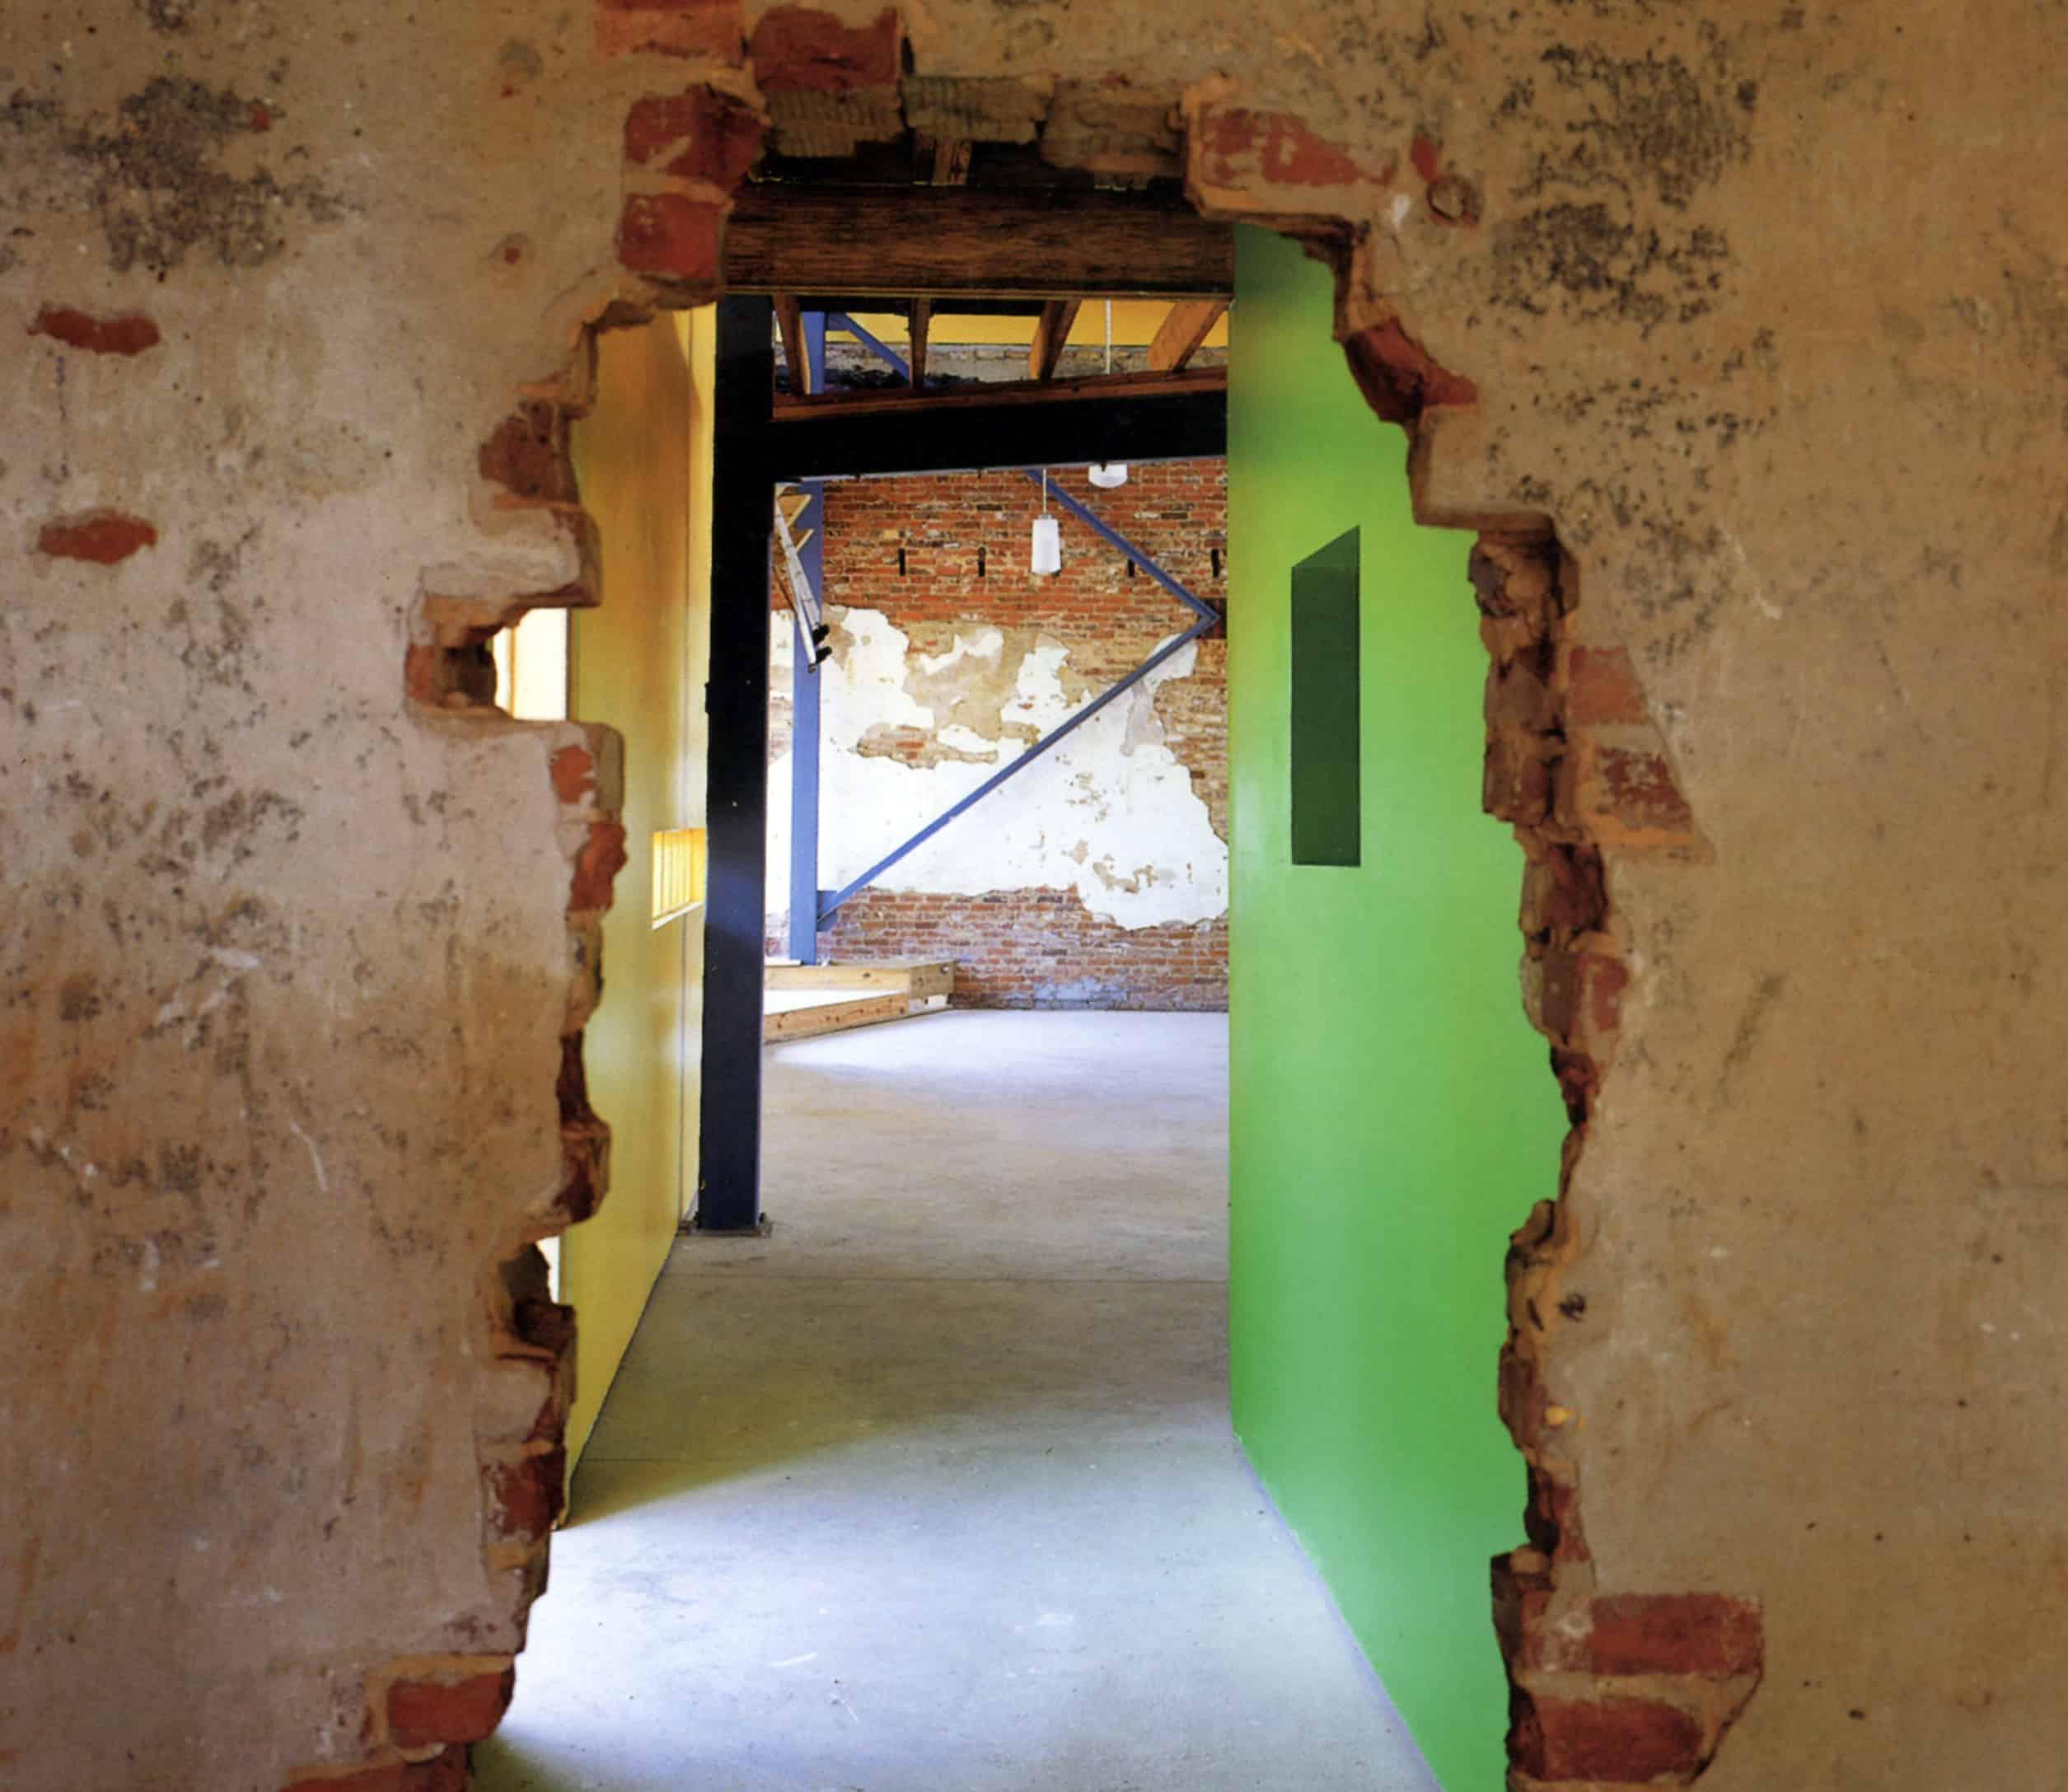 doorway with exposed brick